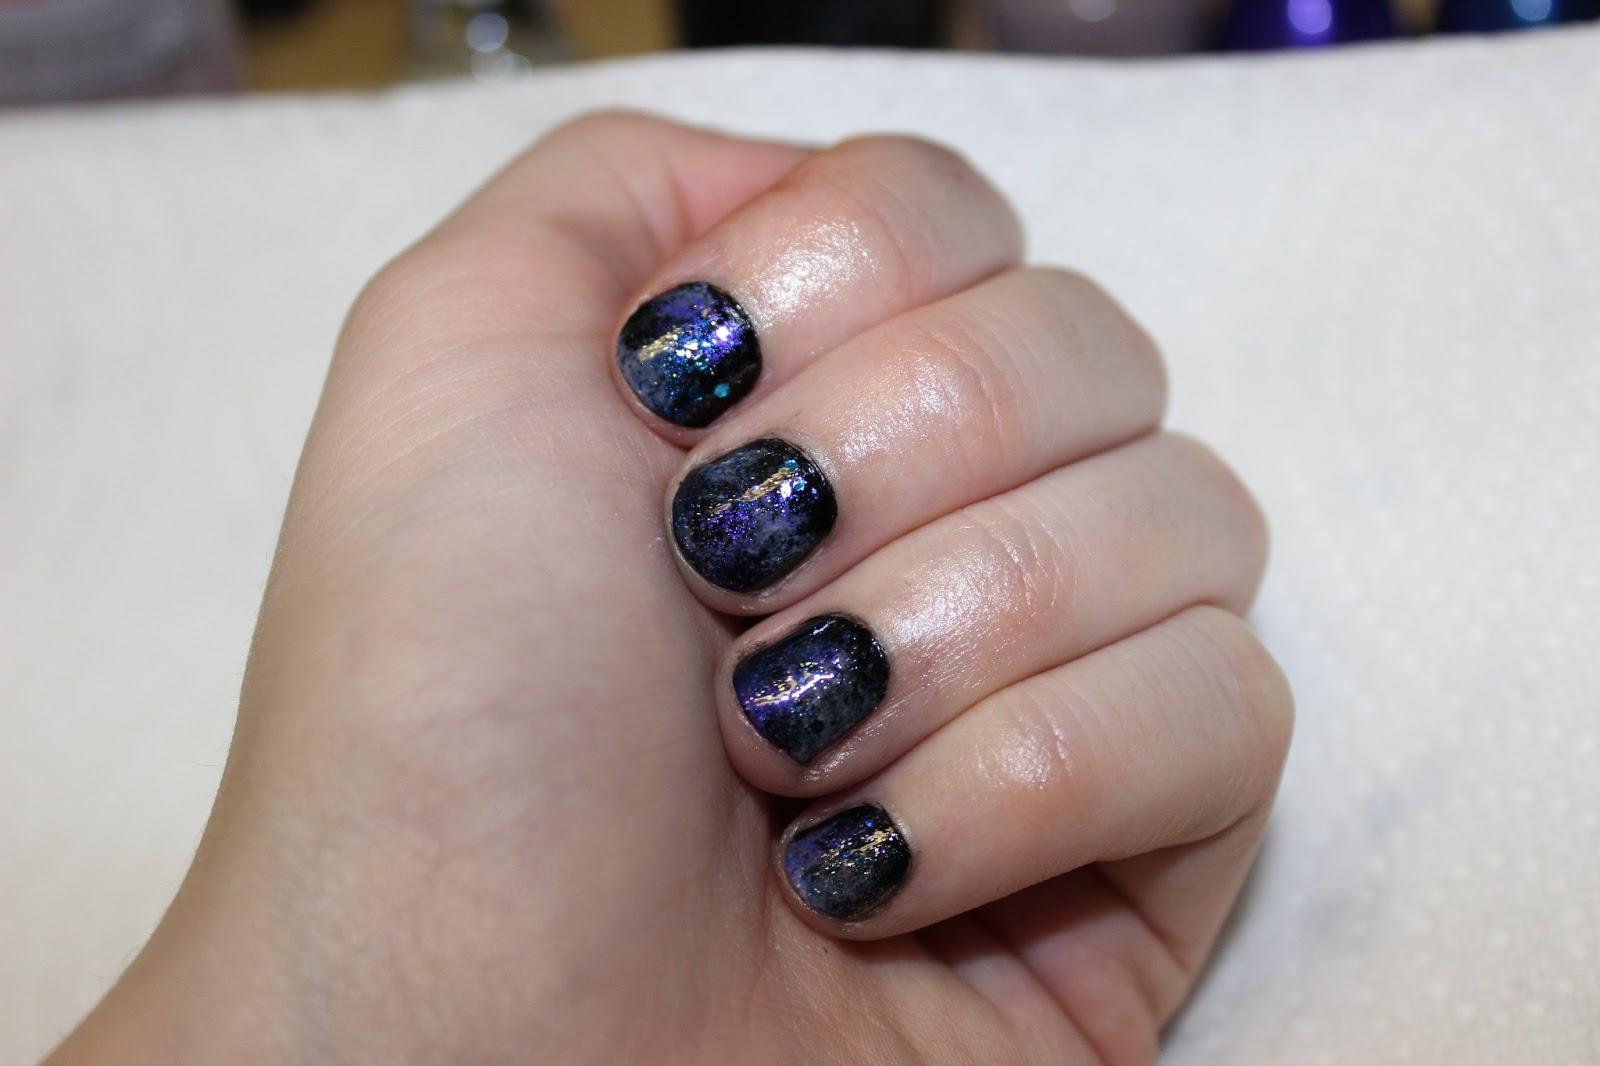 Luhivys Favorite Things Easy Nail Art Tutorial Galaxy Nails